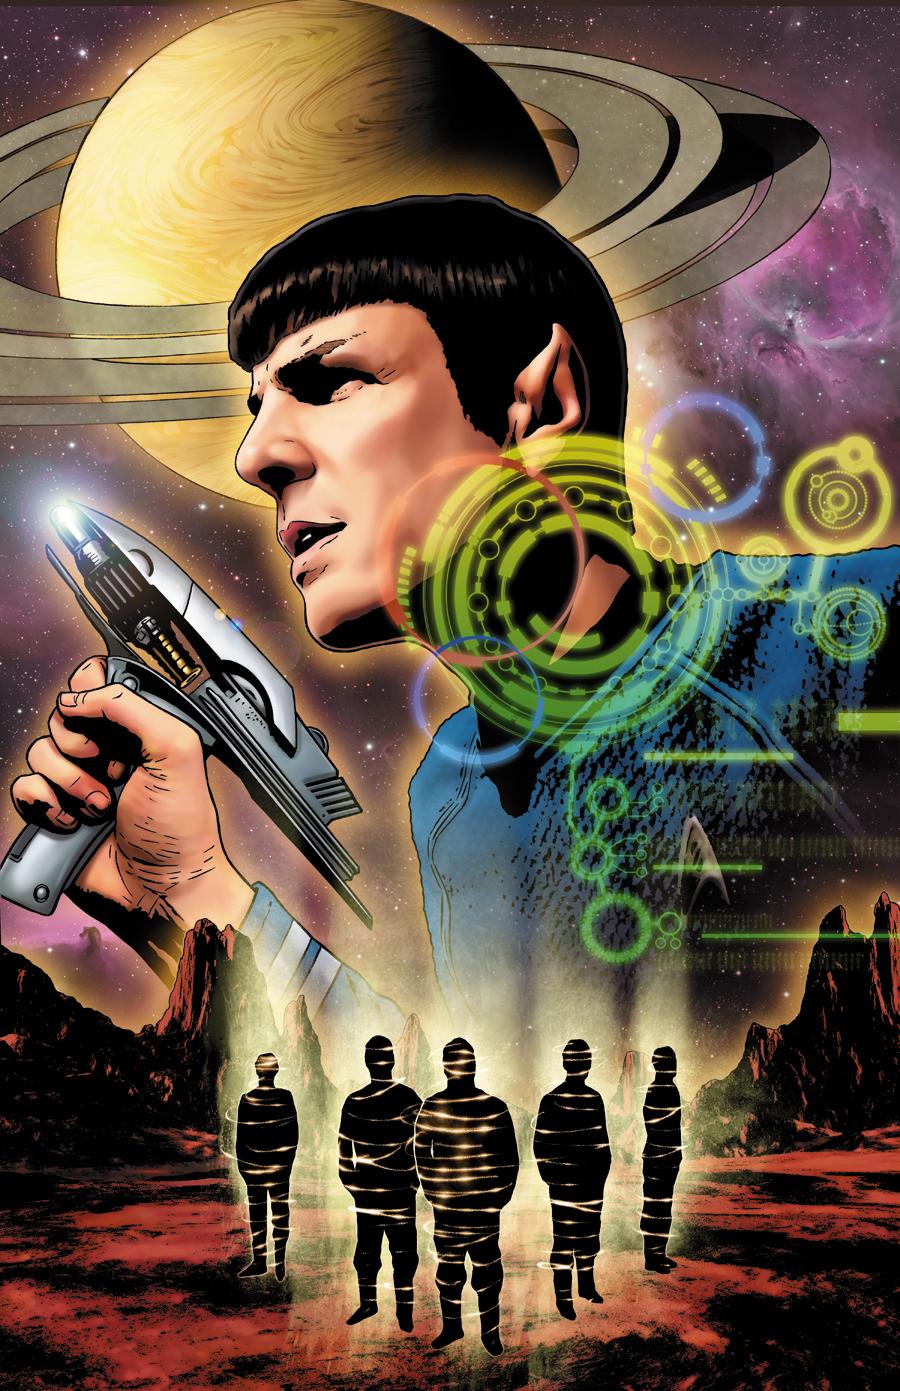 SpockTrekCvrFinal.jpg